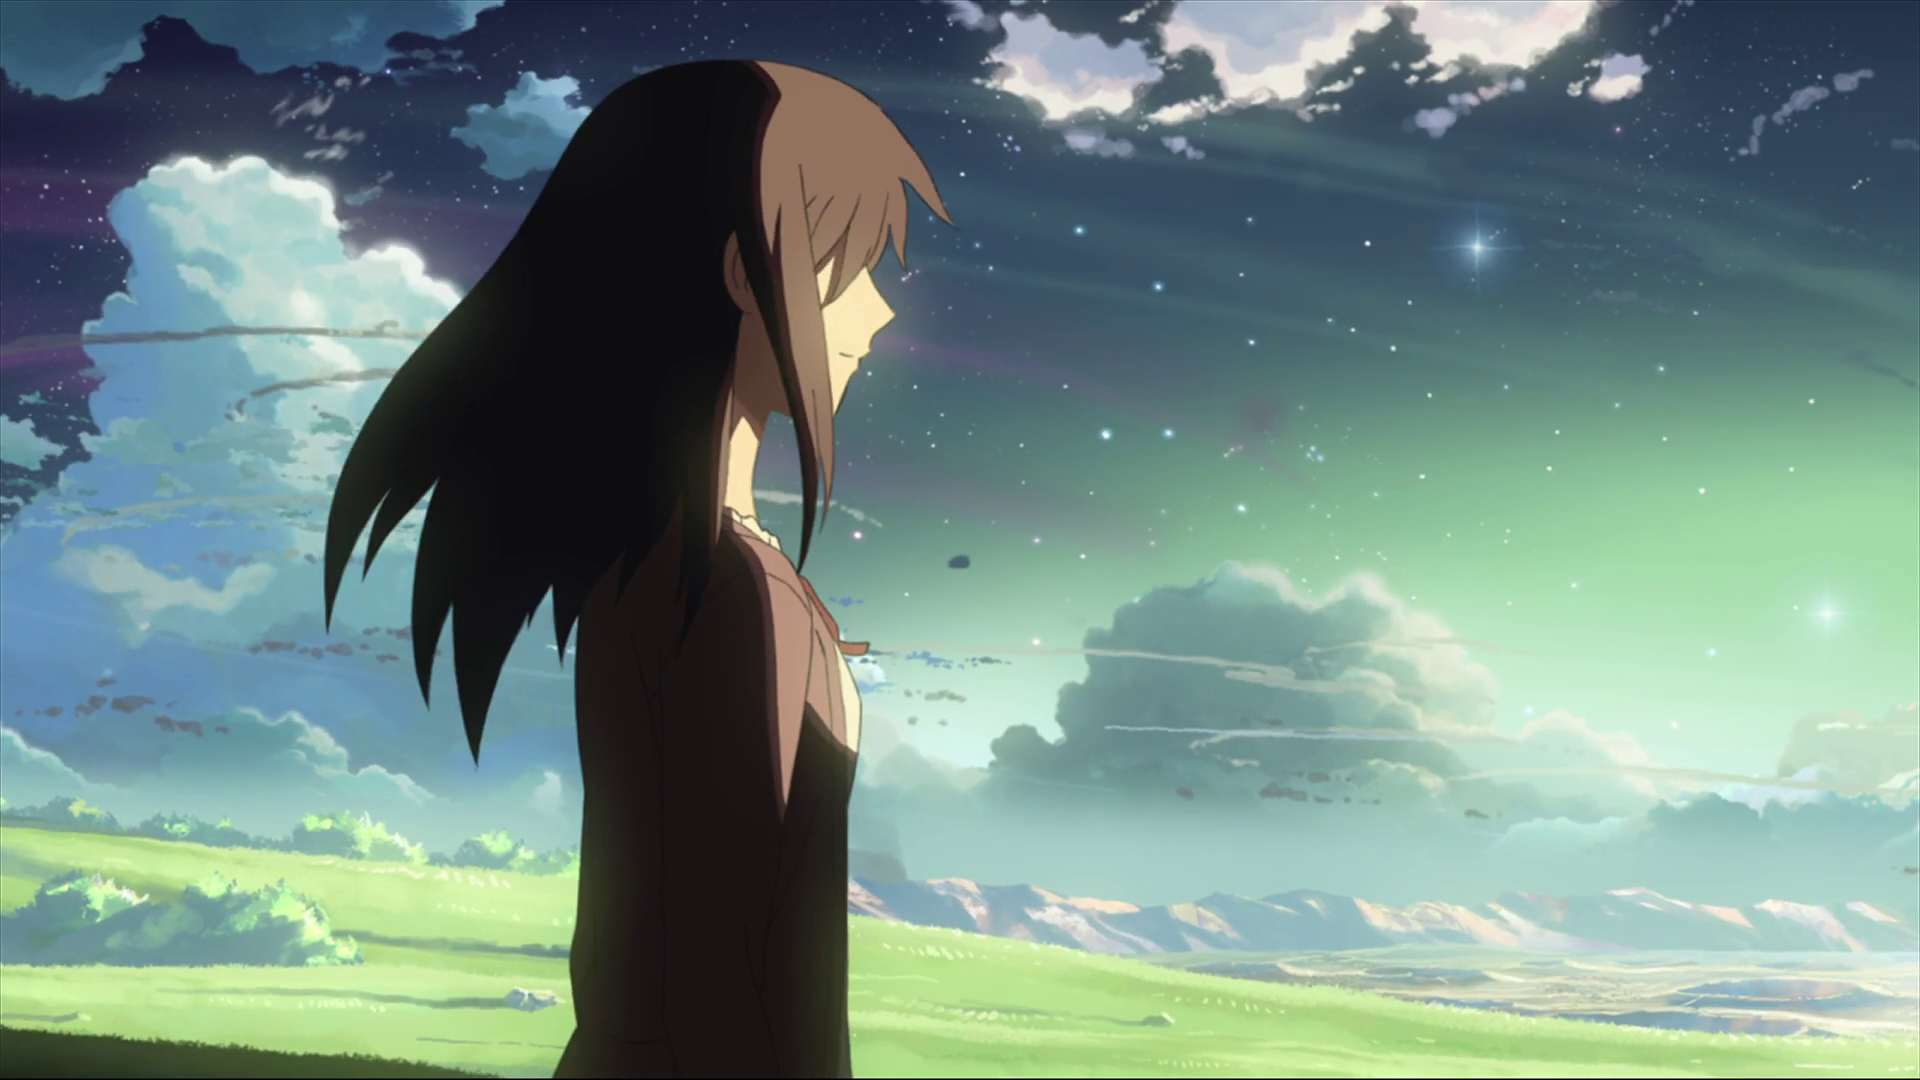 anime 5 centimeters per second majestic makoto shinkai